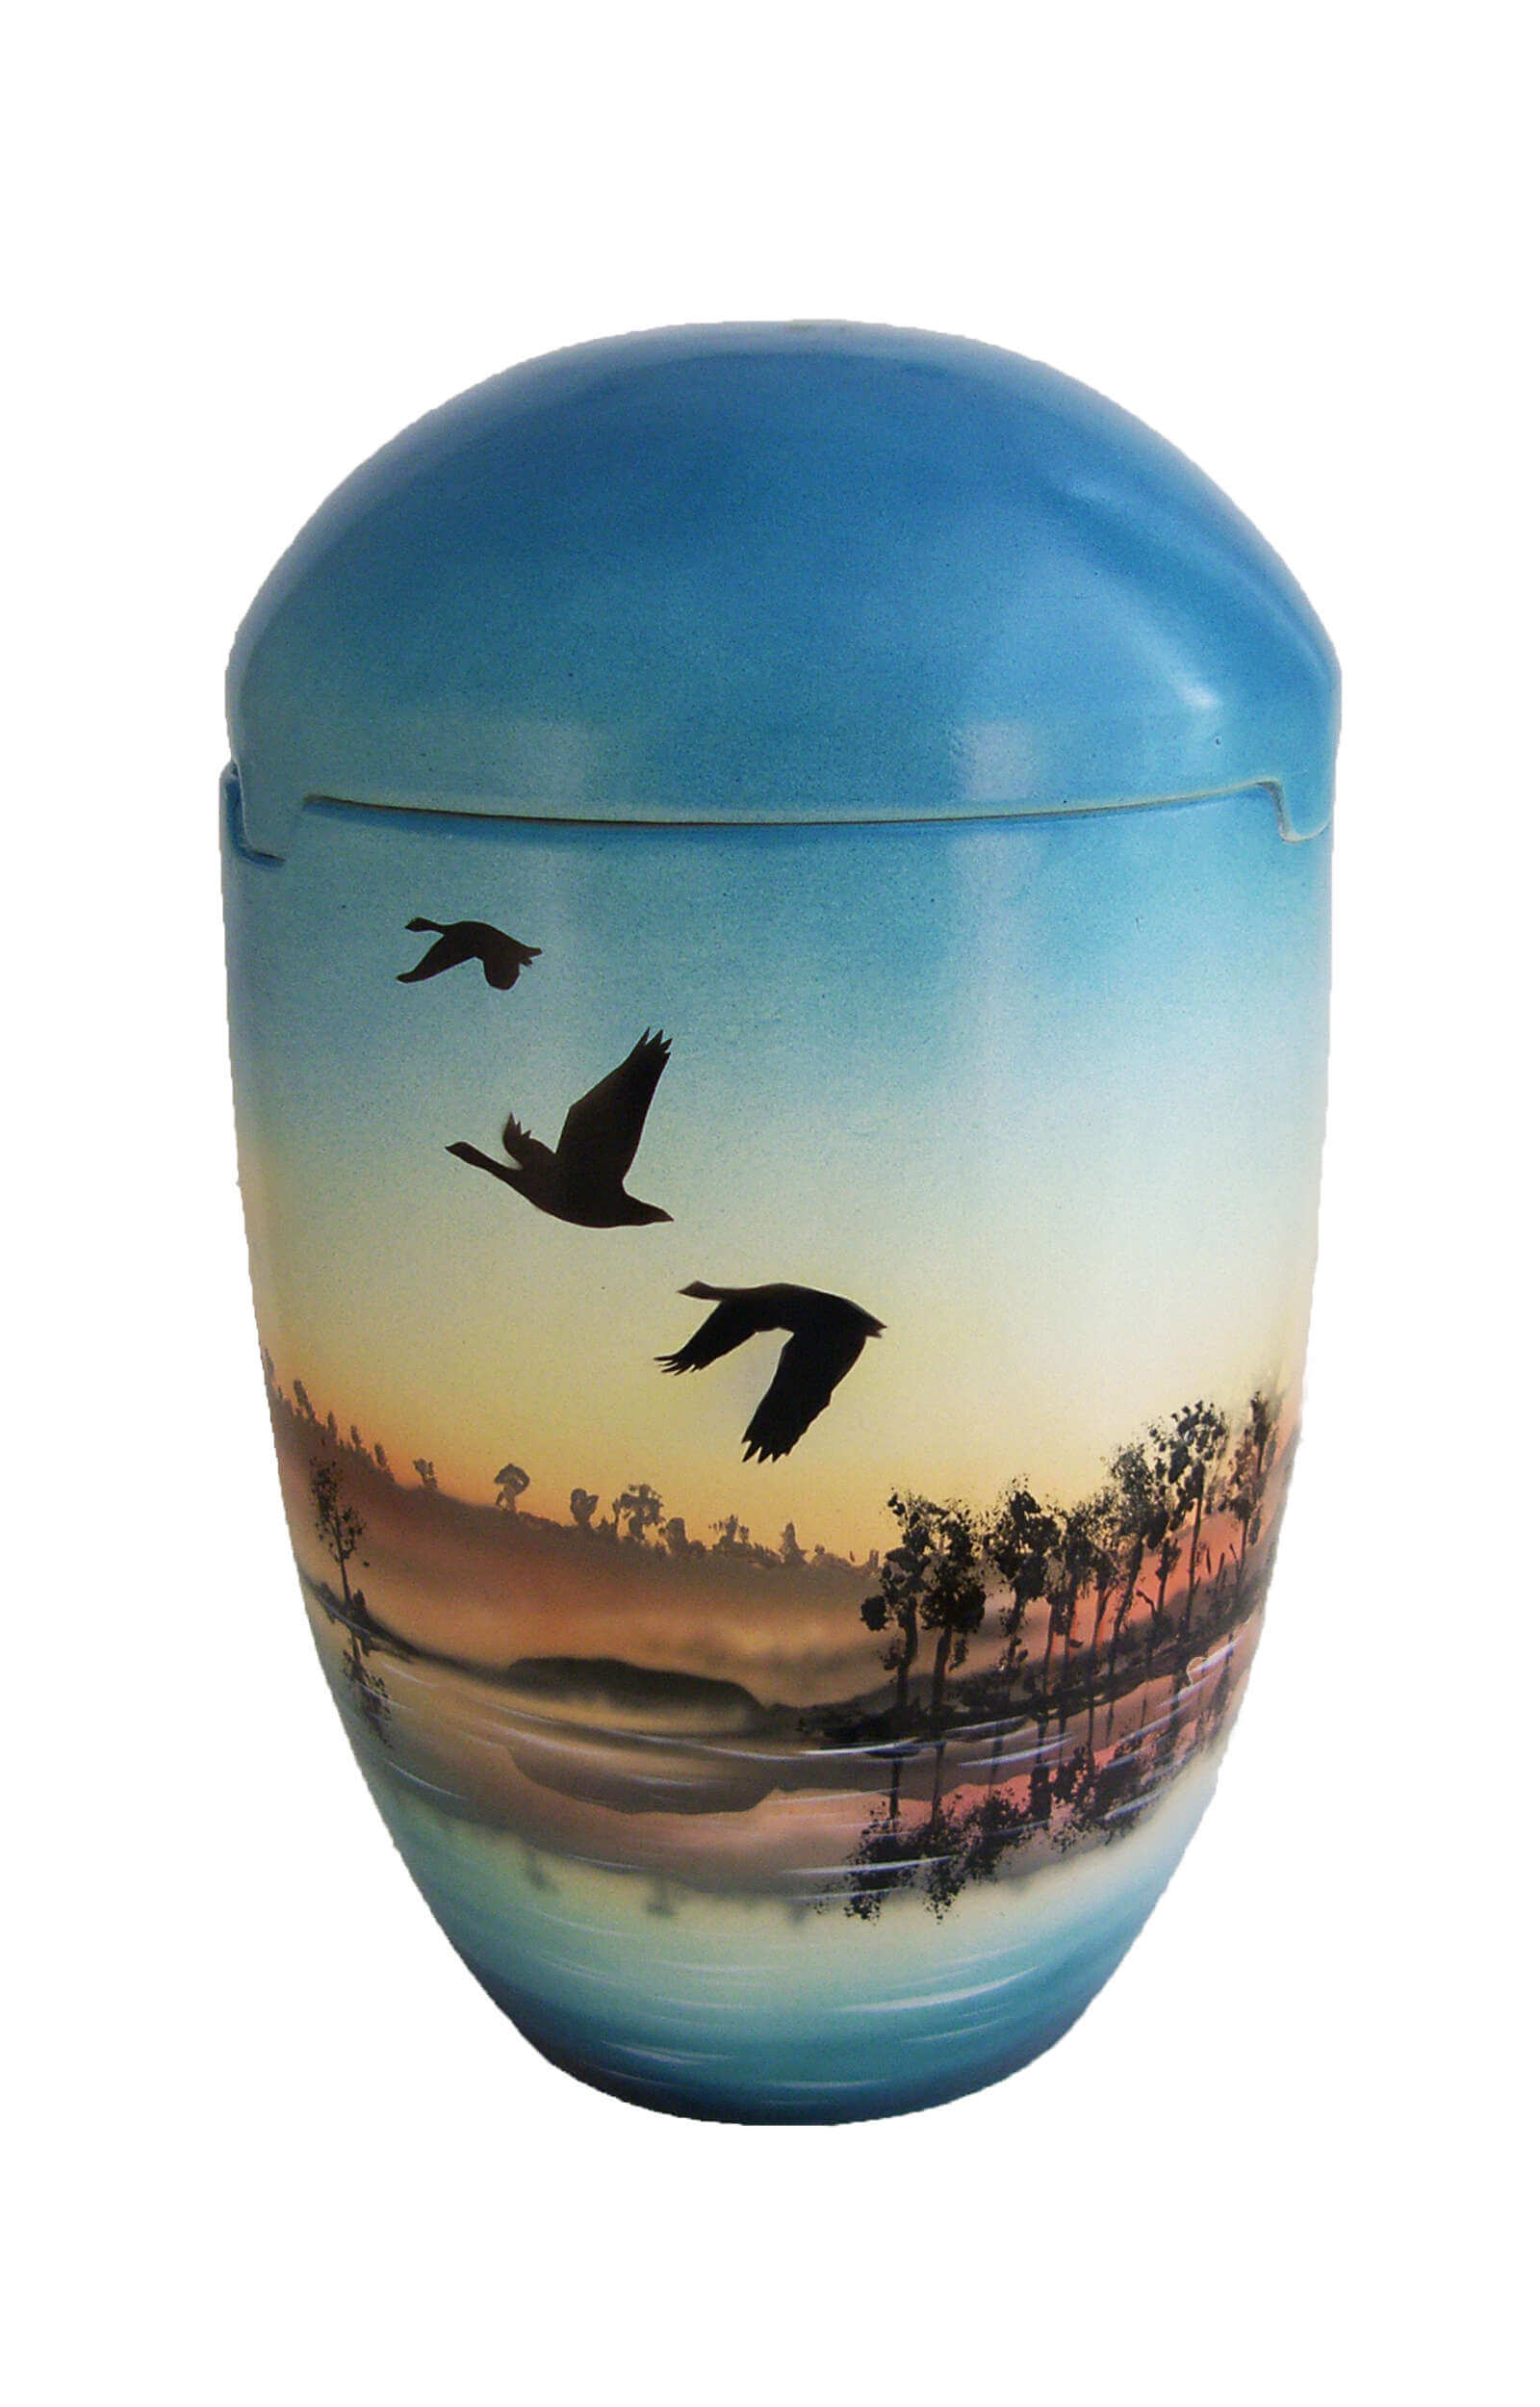 en SBG7030 sea urn blue sky sunrise birds biodigradable funeral urns on sale